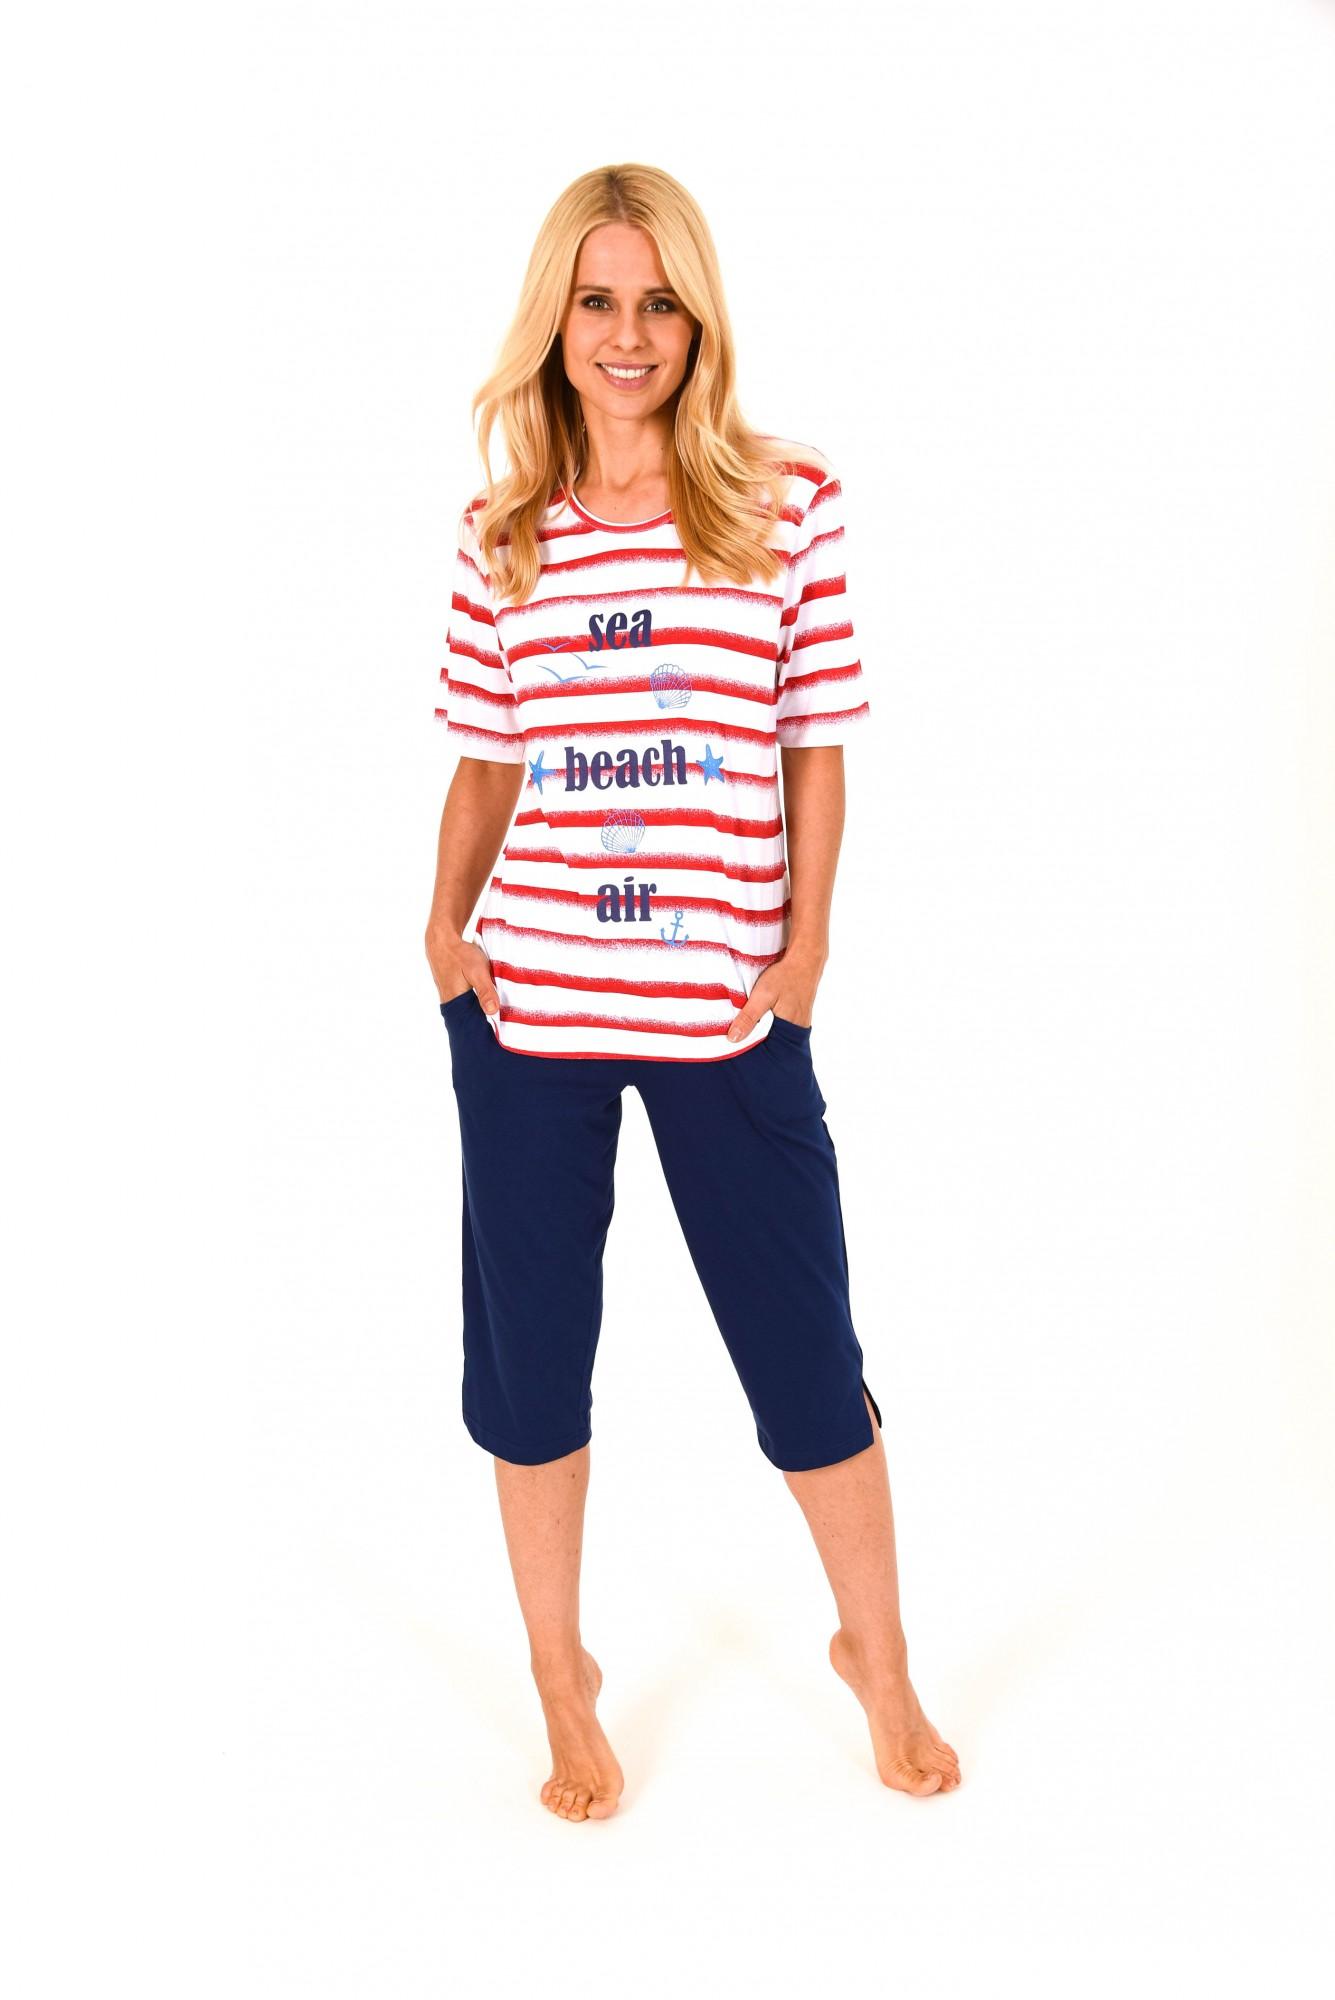 Toller Damen Pyjama mit Caprihose kurzarm in maritimer Streifenoptik – 171 204 90 868 001